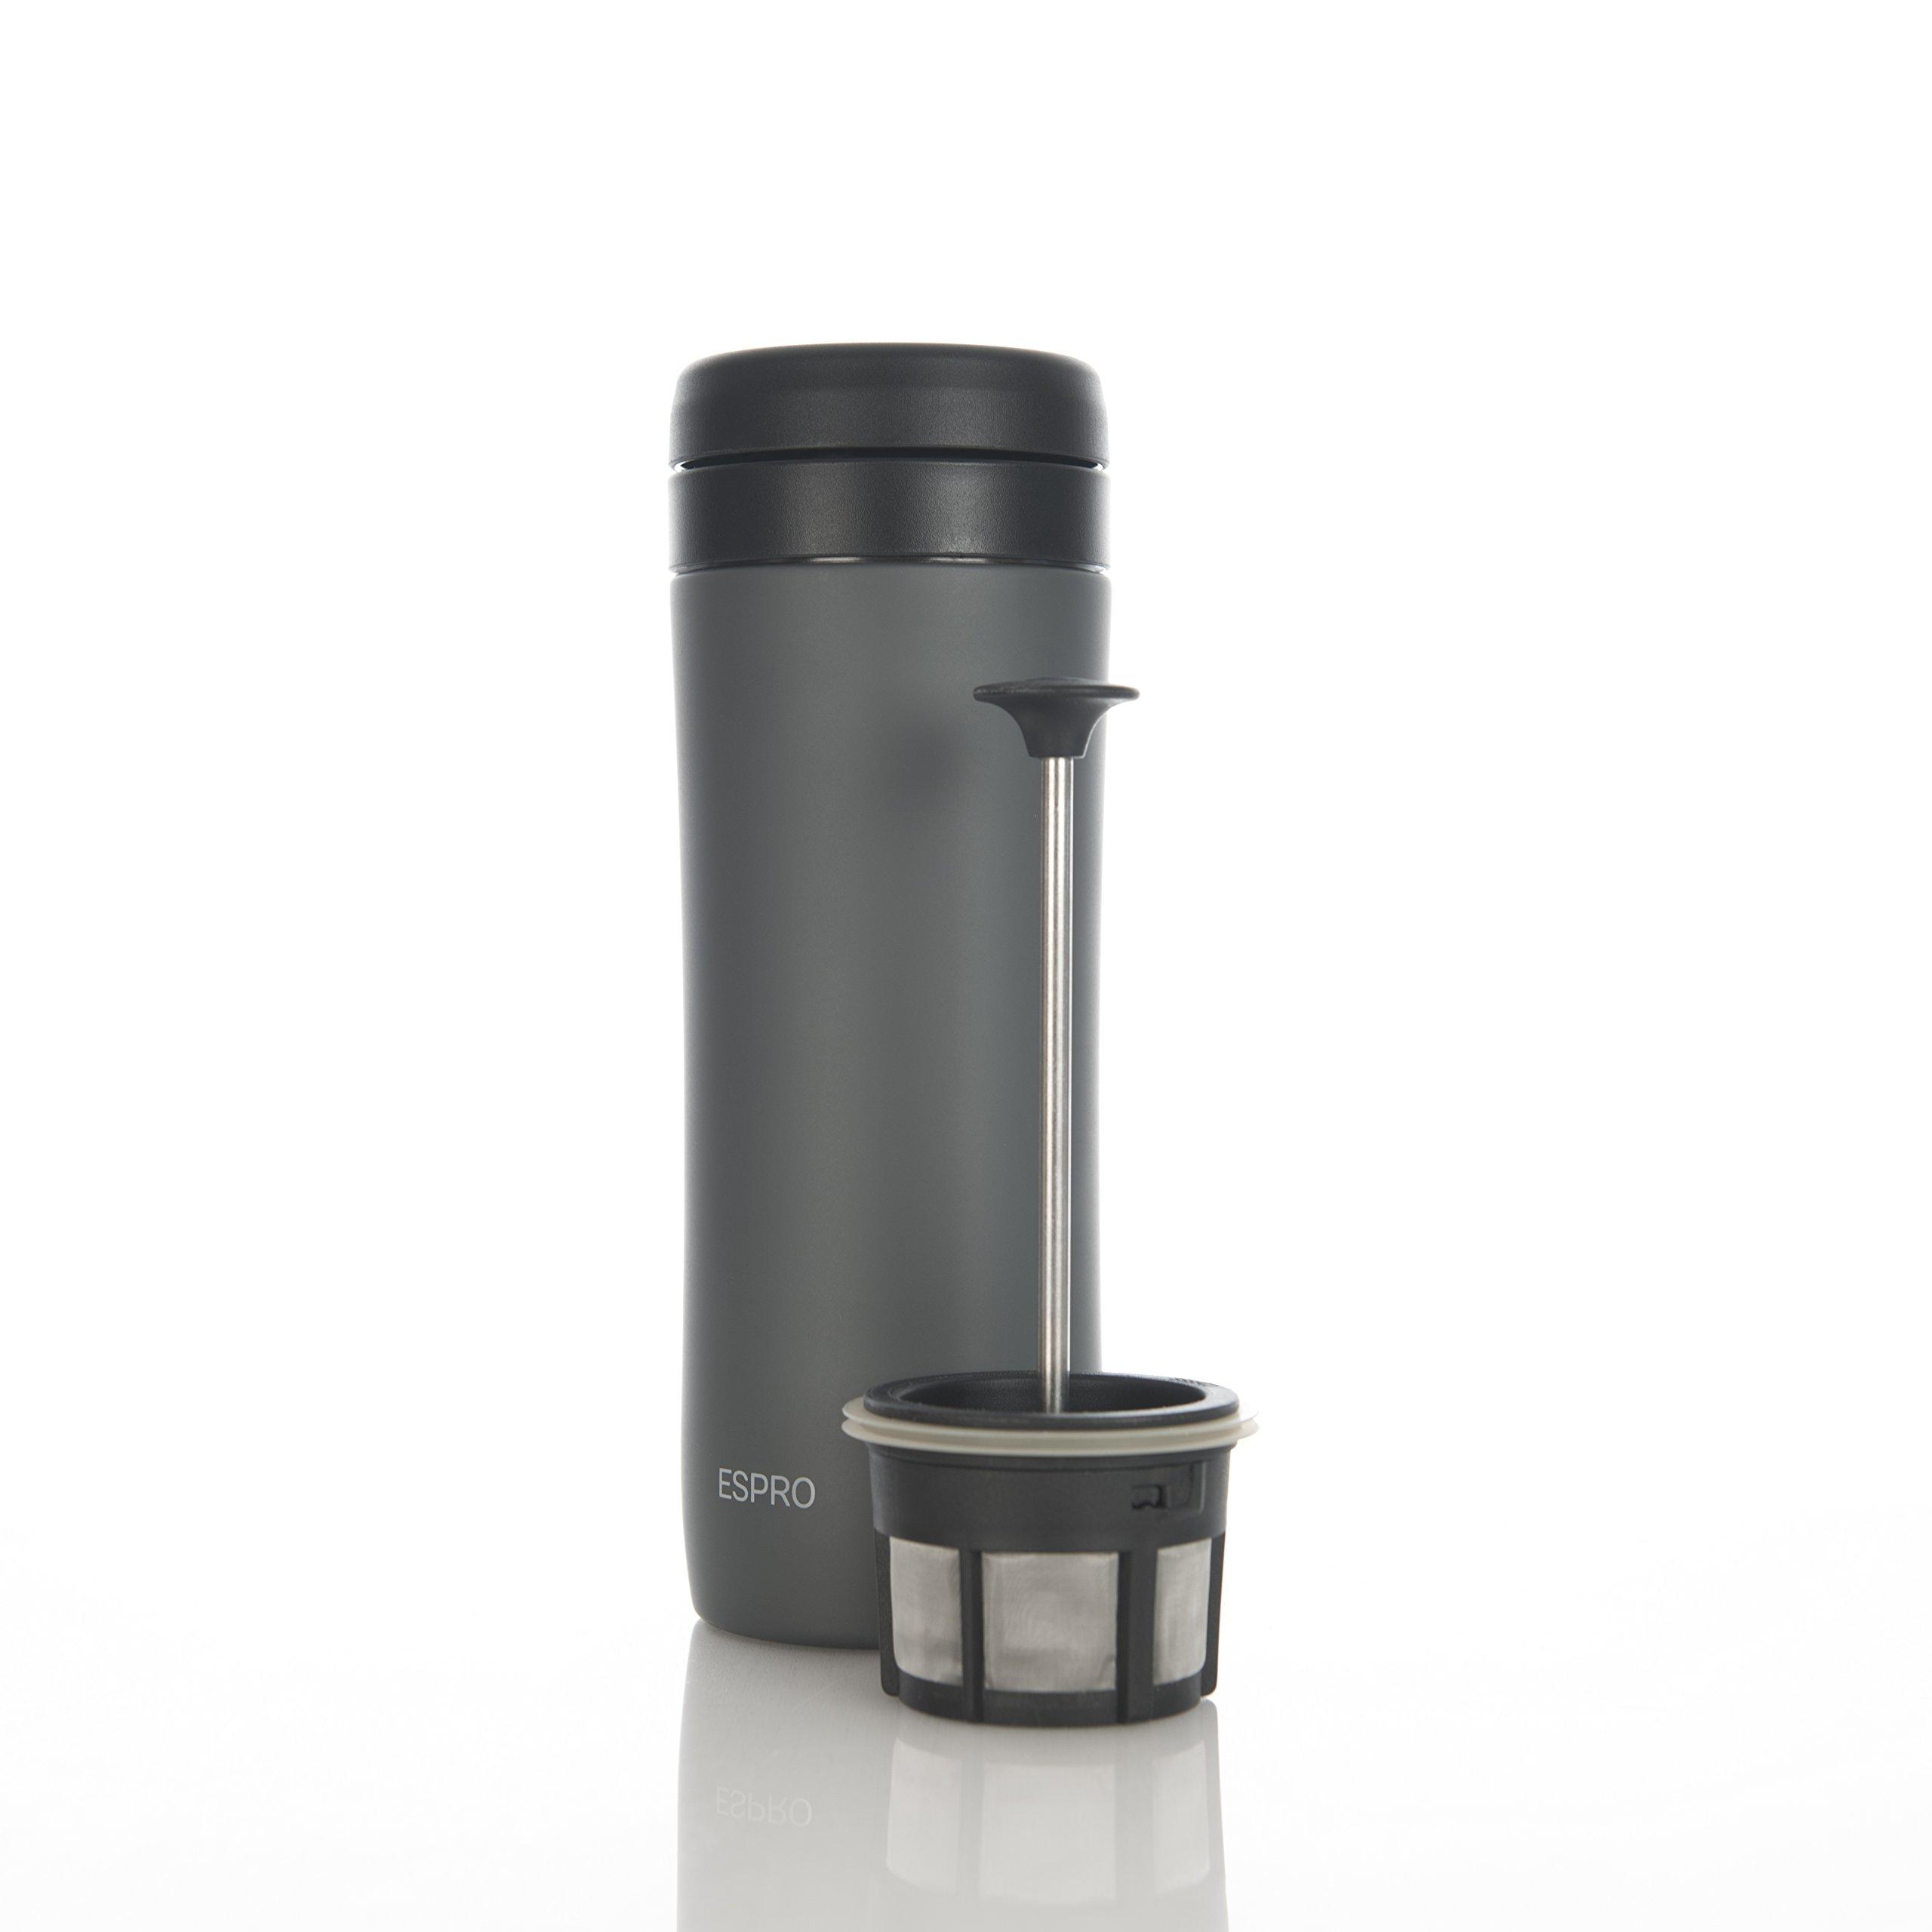 Espro Travel Coffee Press, Stainless Steel, 12 oz (Gunmental Grey)